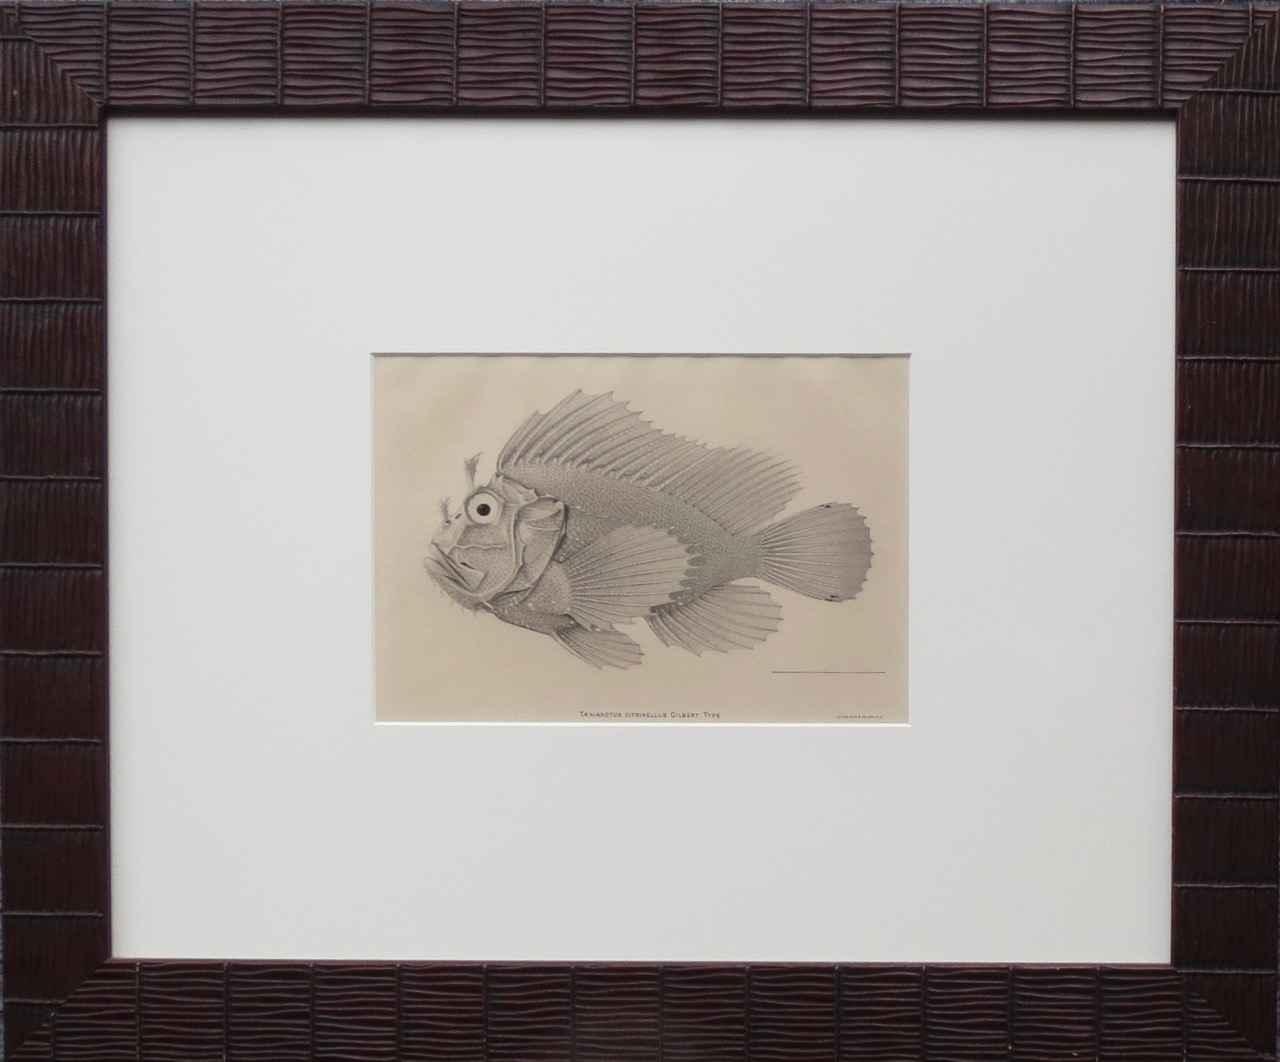 Fish Print_Taenianotu... by   Unknown - Masterpiece Online